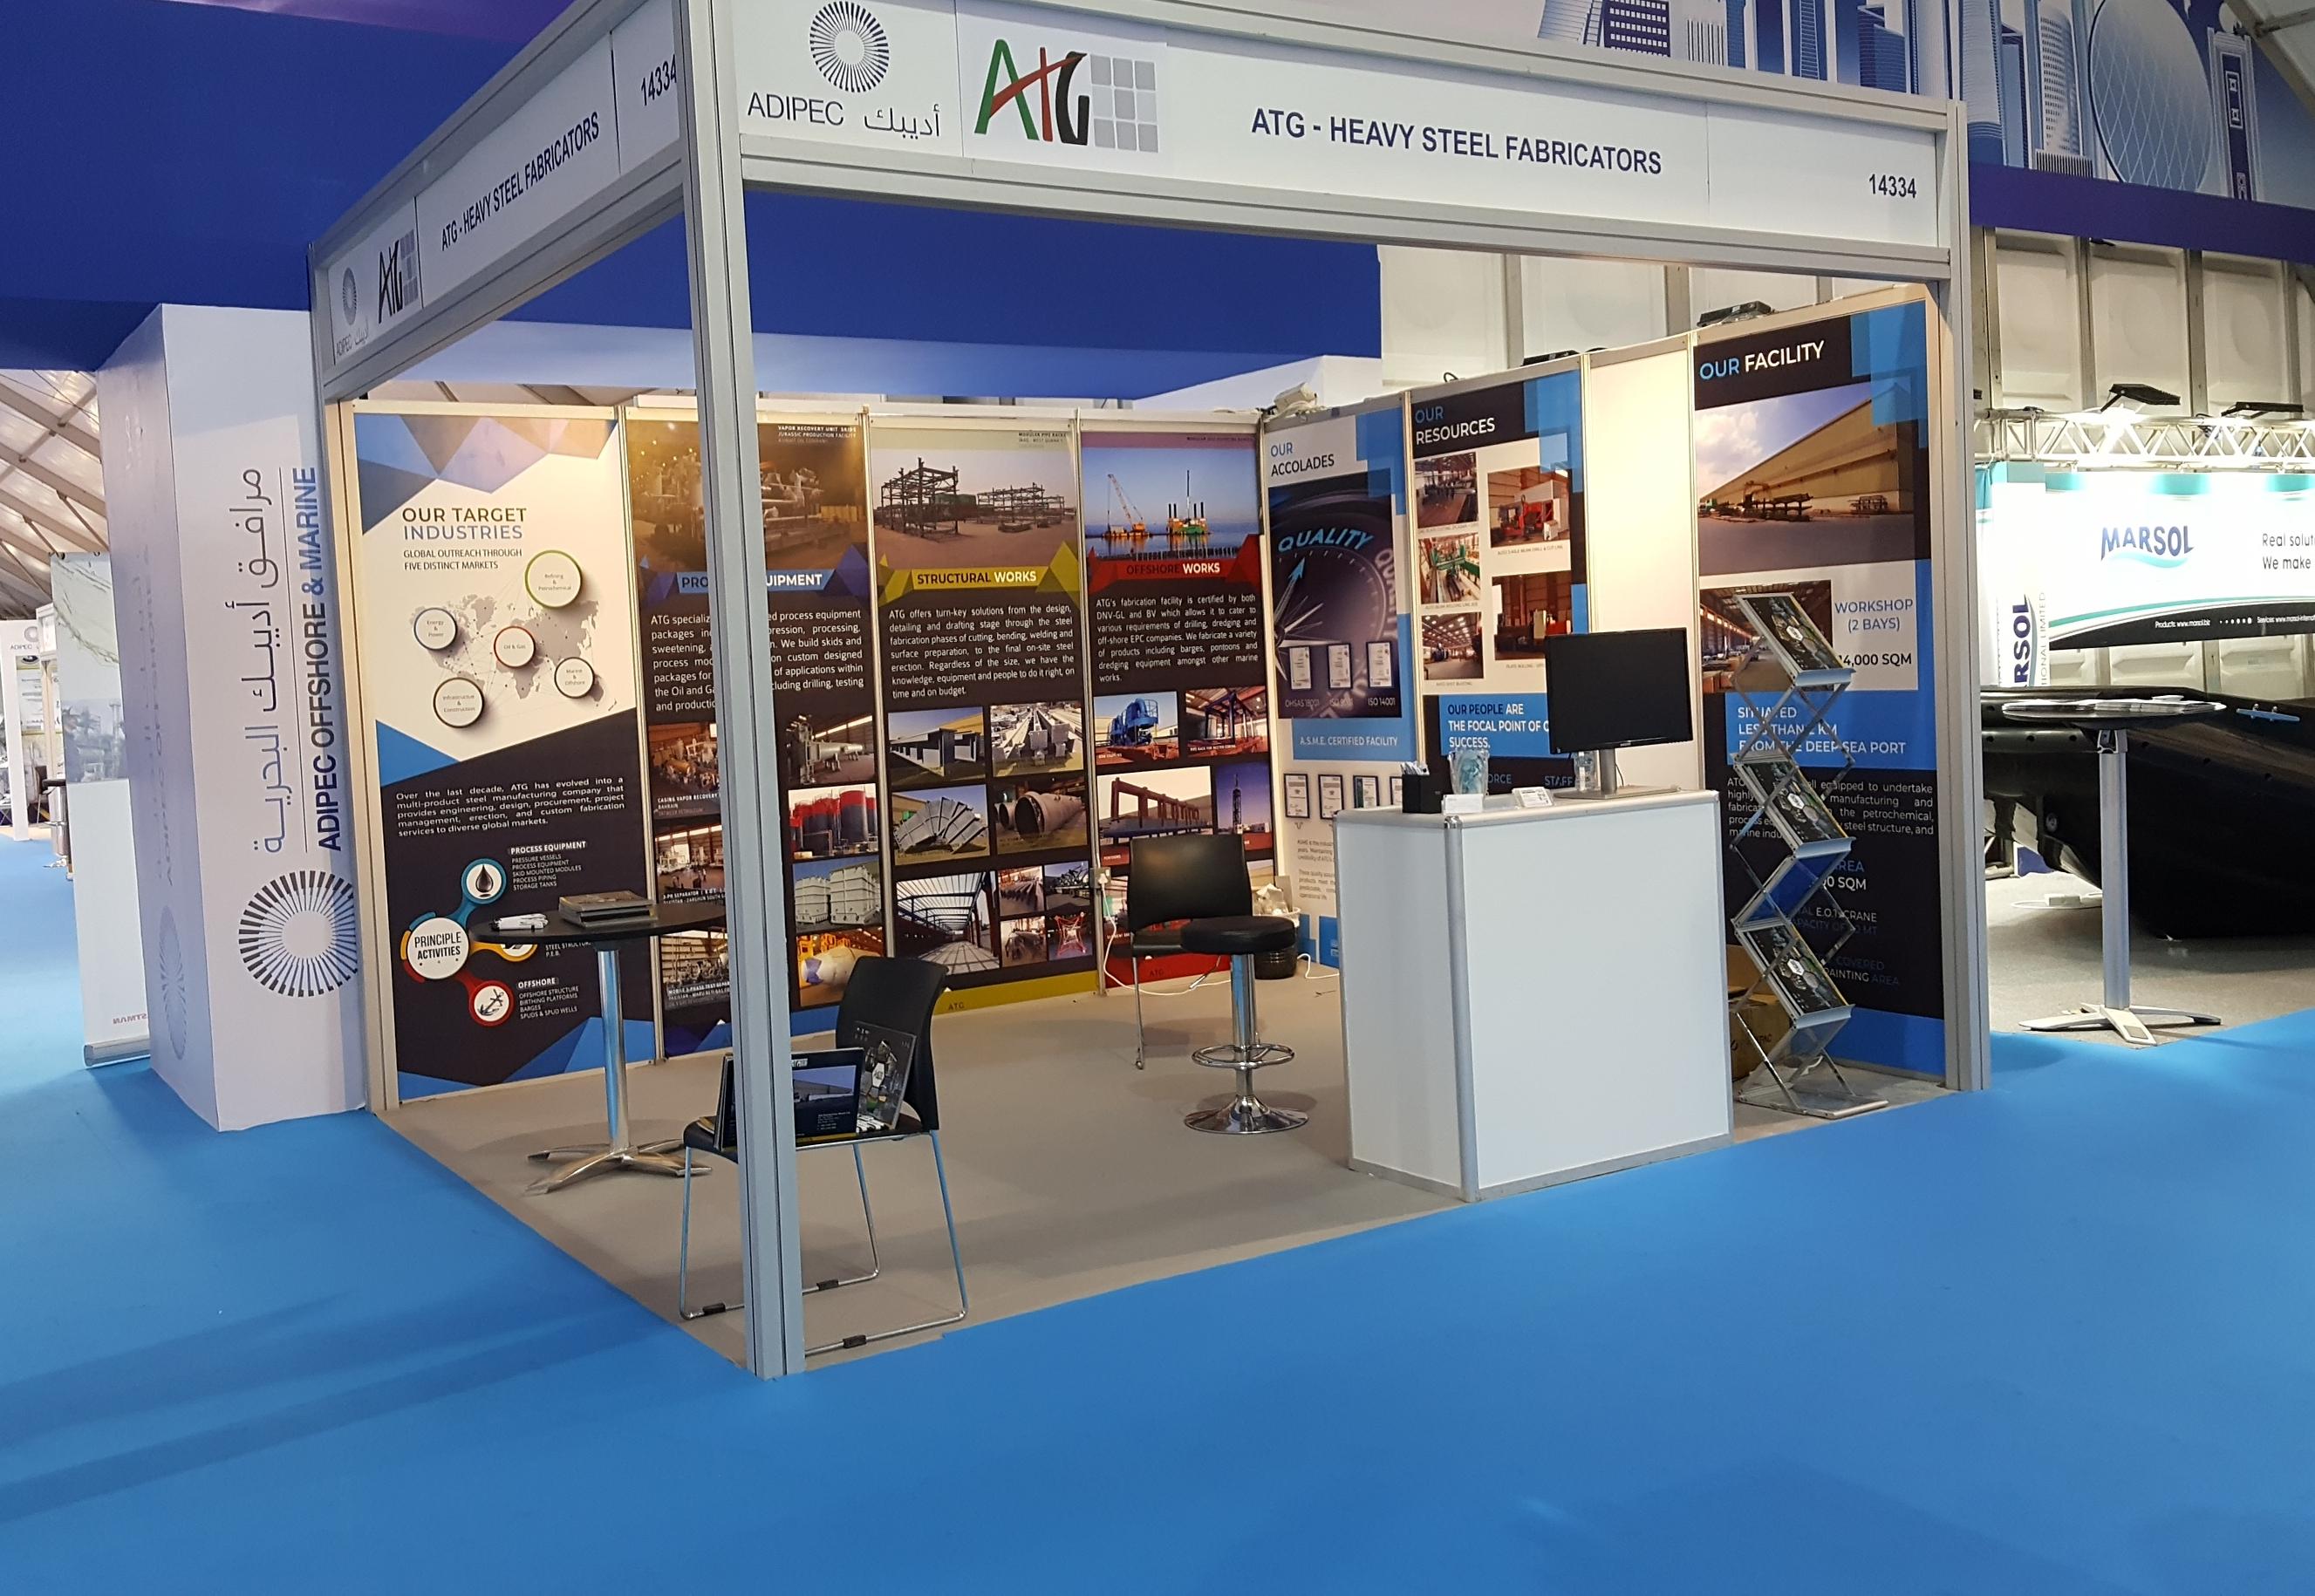 ATG Stand at ADIPEC 2017